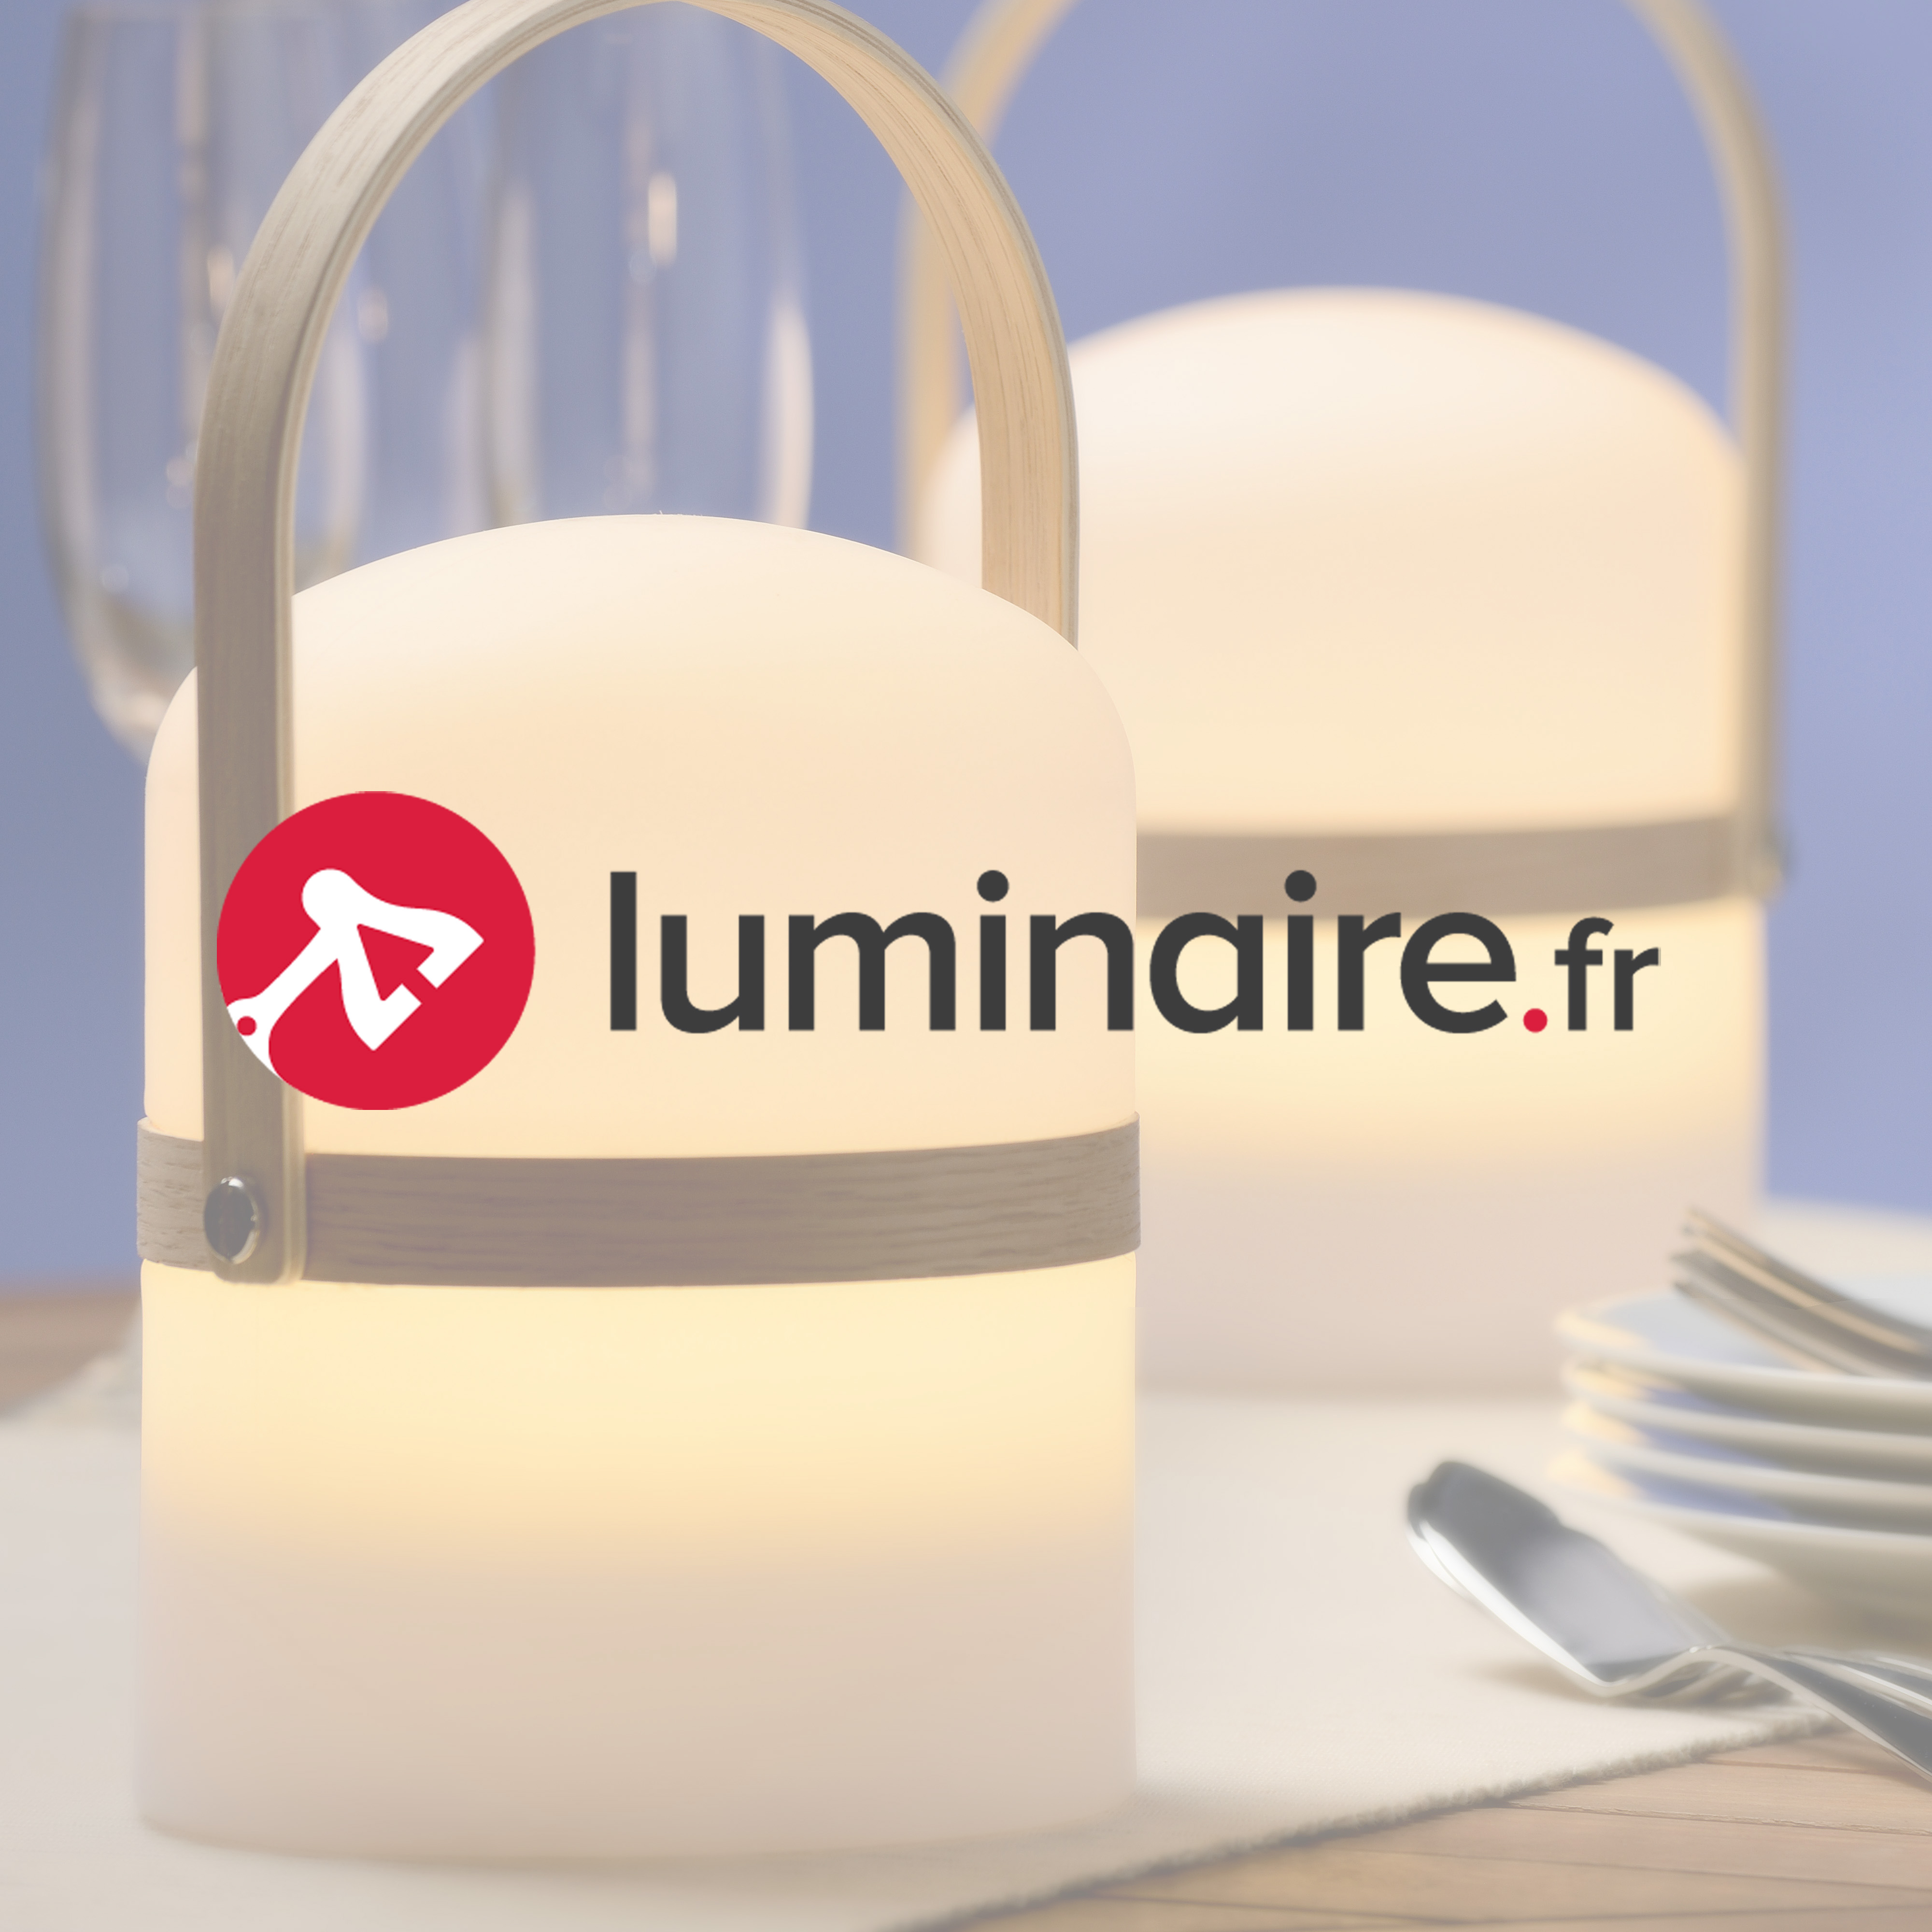 Luminaire.fr